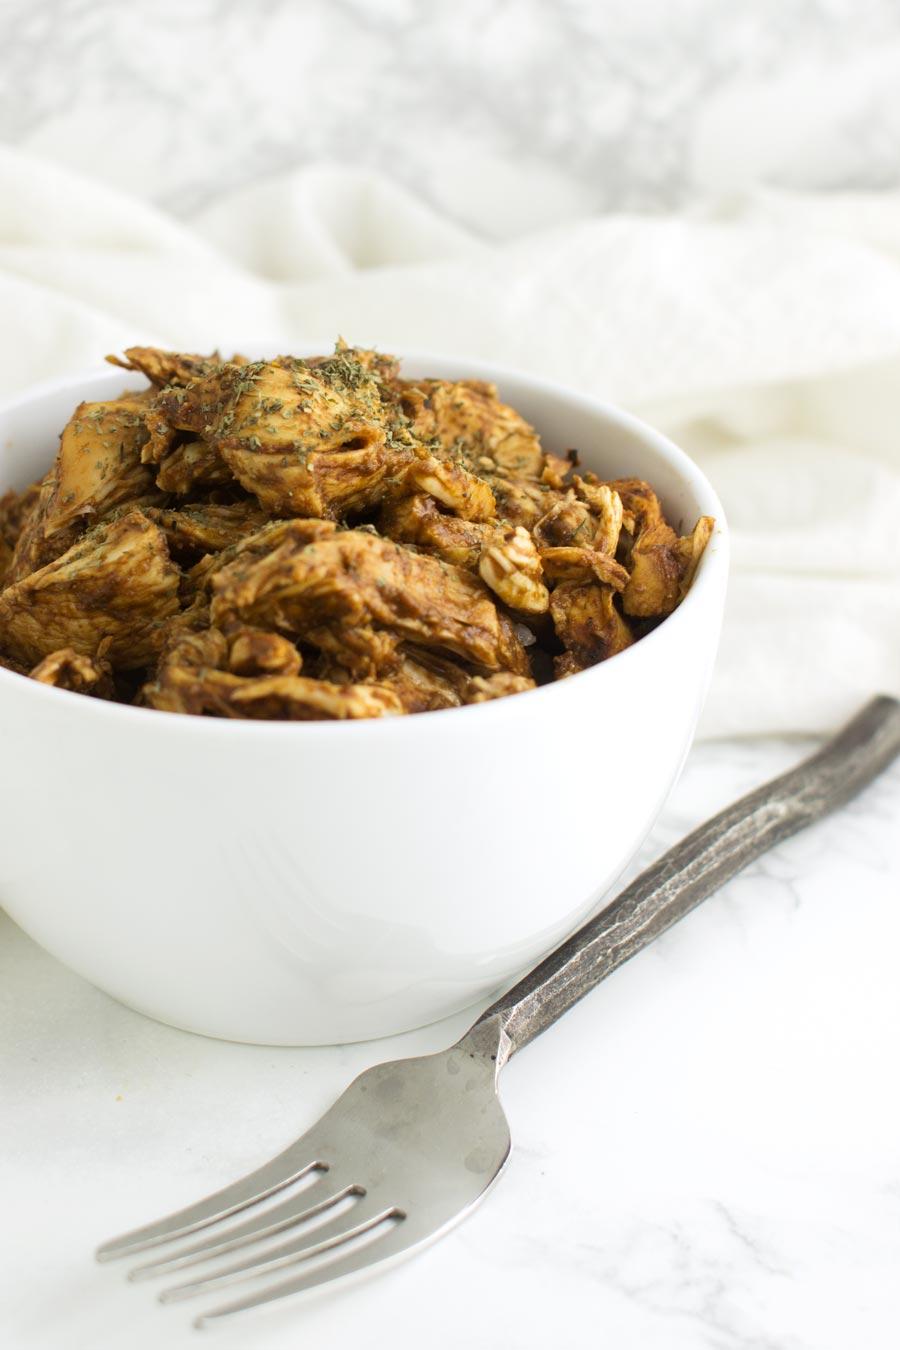 Chicken Mole recipe from acleanplate.com #paleo #aip #glutenfree